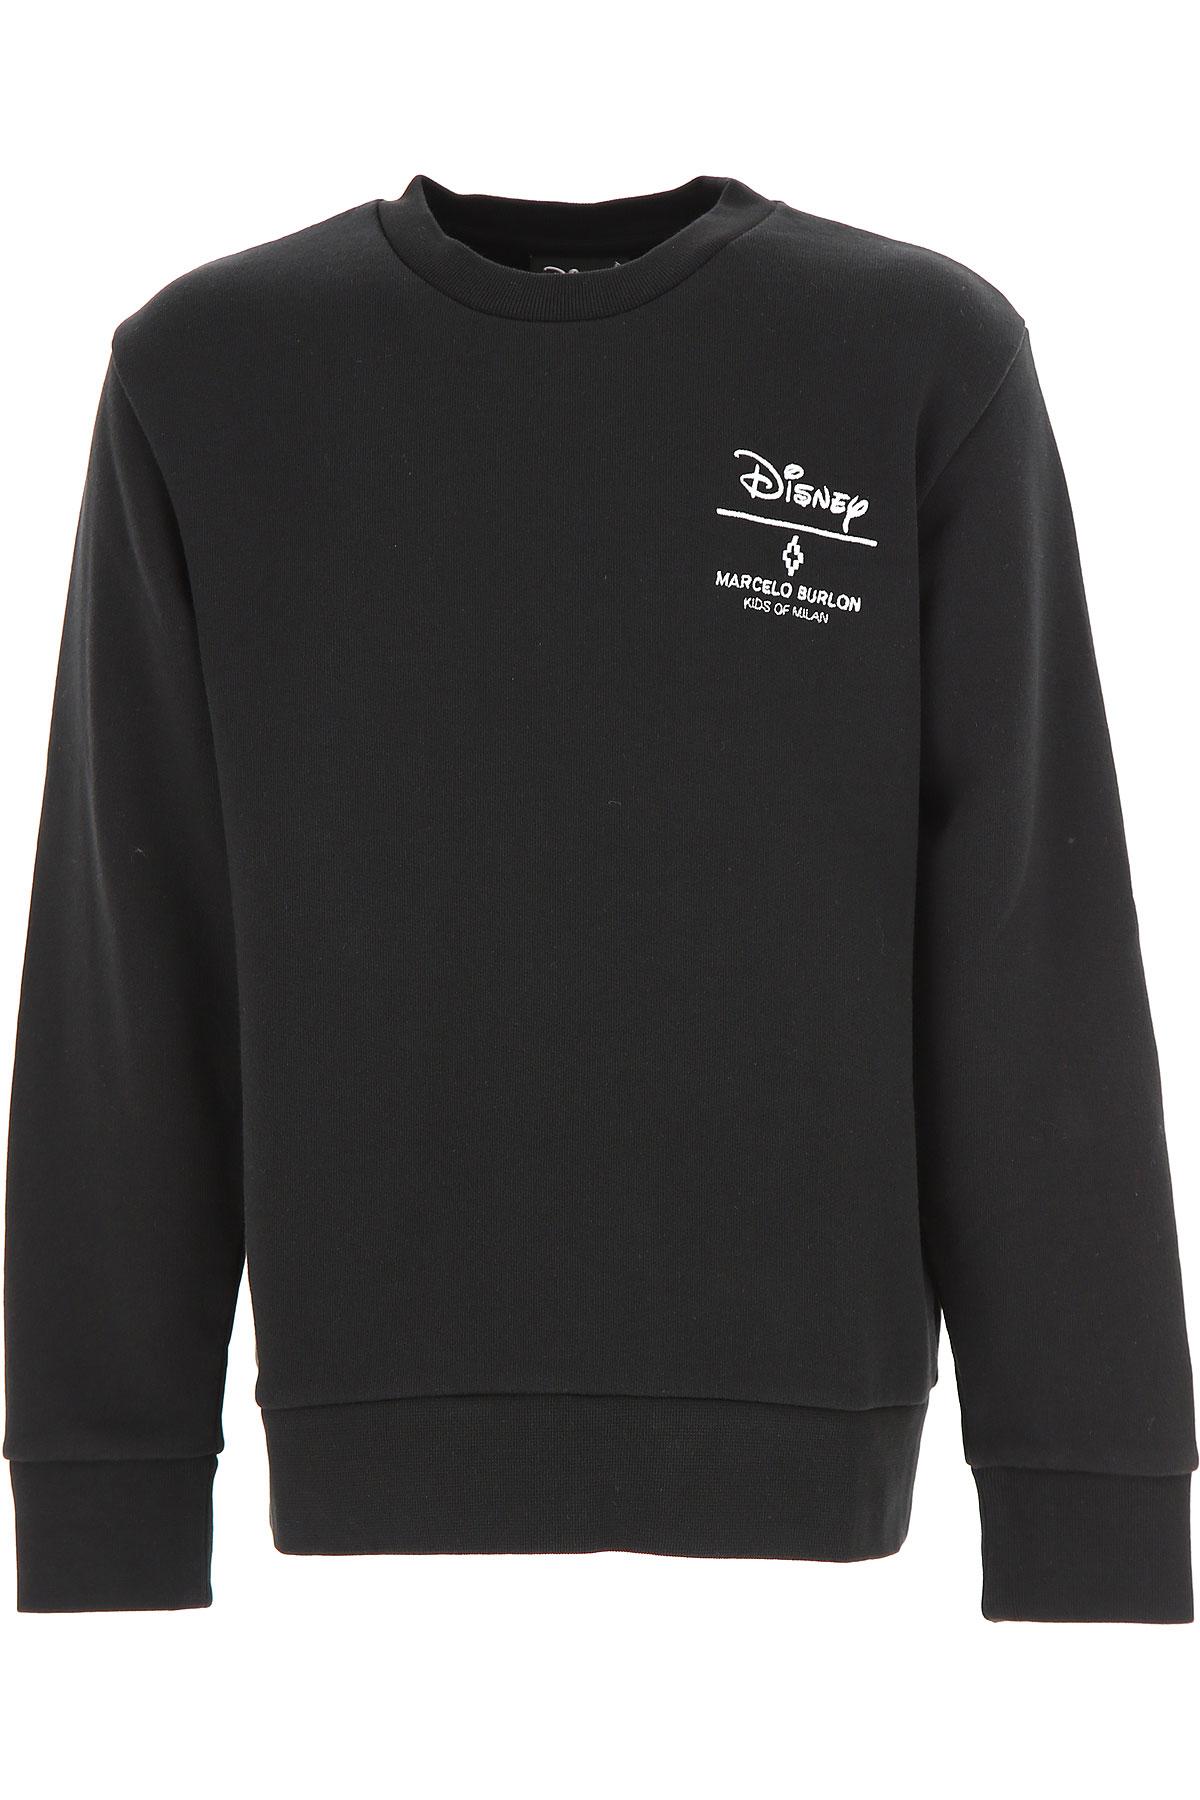 Marcelo Burlon Kids Sweatshirts & Hoodies for Boys On Sale in Outlet, Black, Cotton, 2019, 10Y 6Y